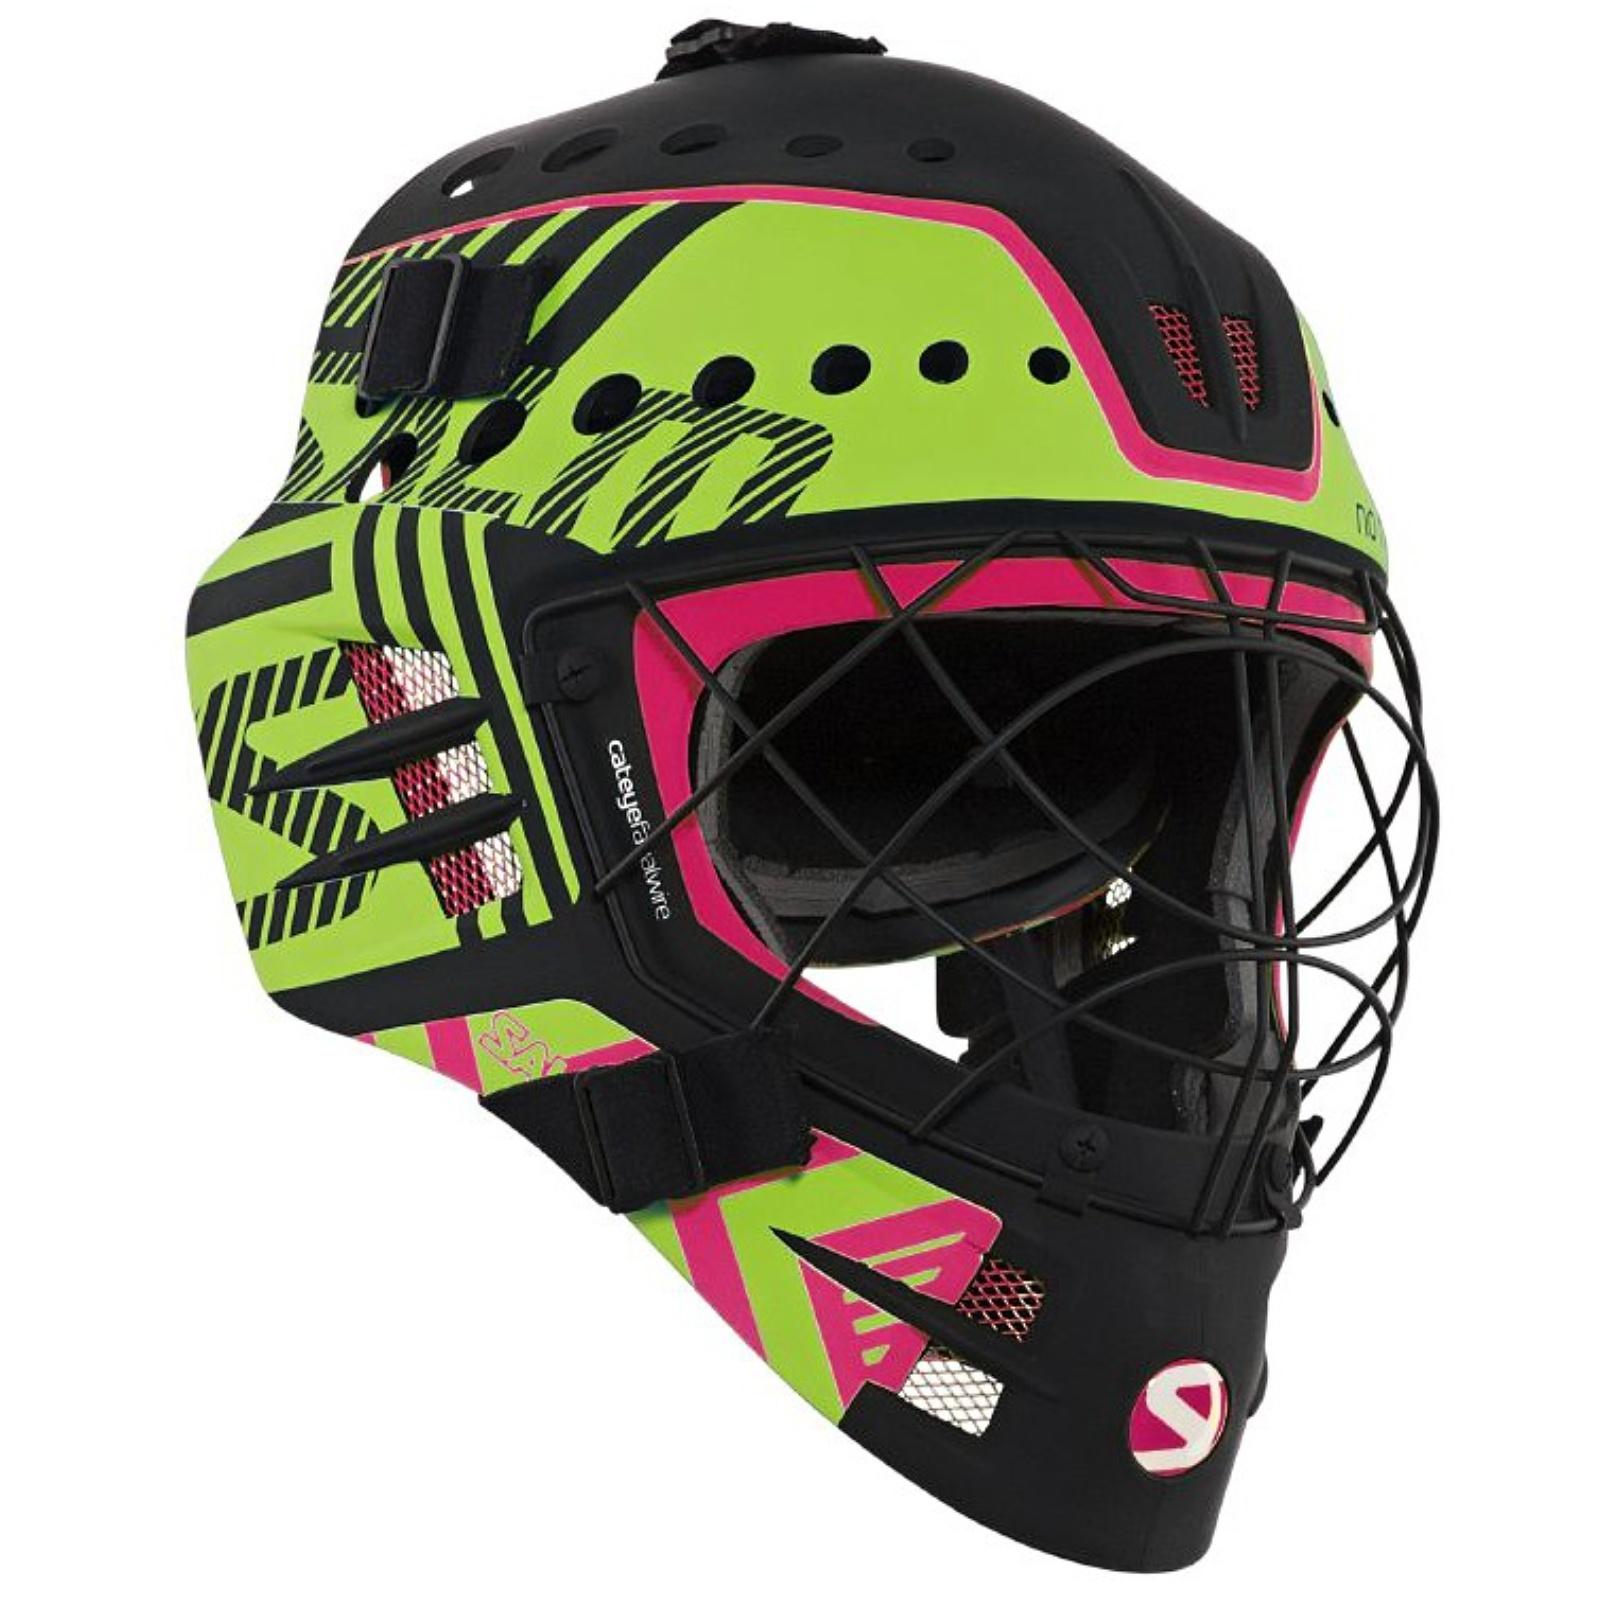 Florbalová maska SALMING Travis Elite Helmet černo-zelená